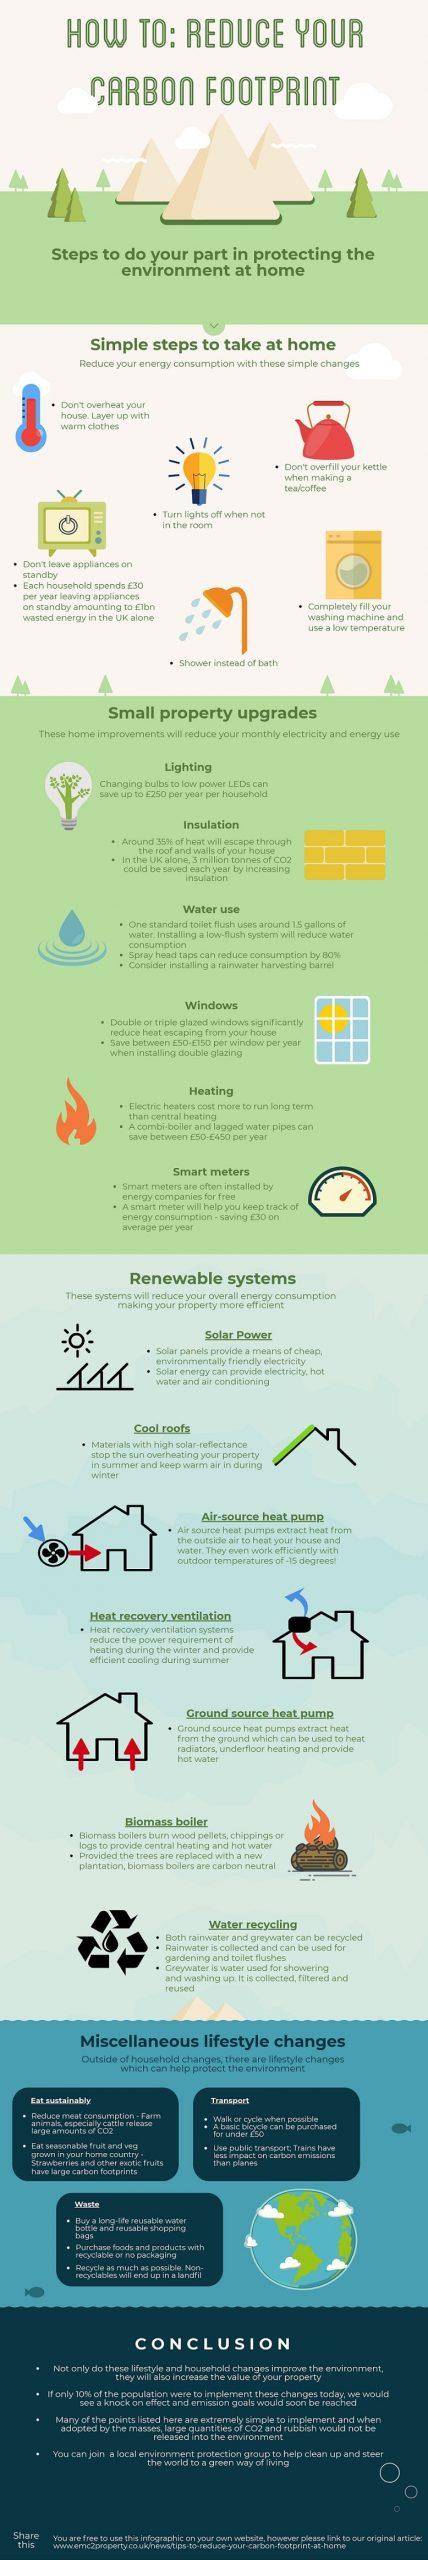 reduce carbon footprint at home infogrpahic